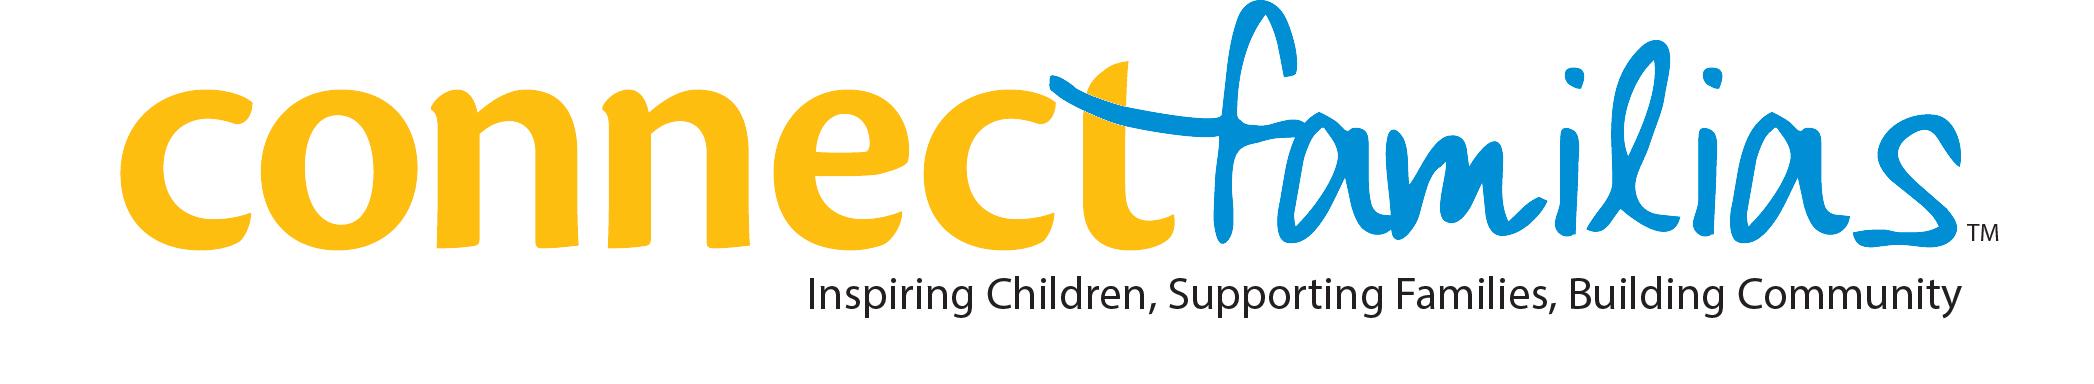 CF logo tagline JPEG.jpg